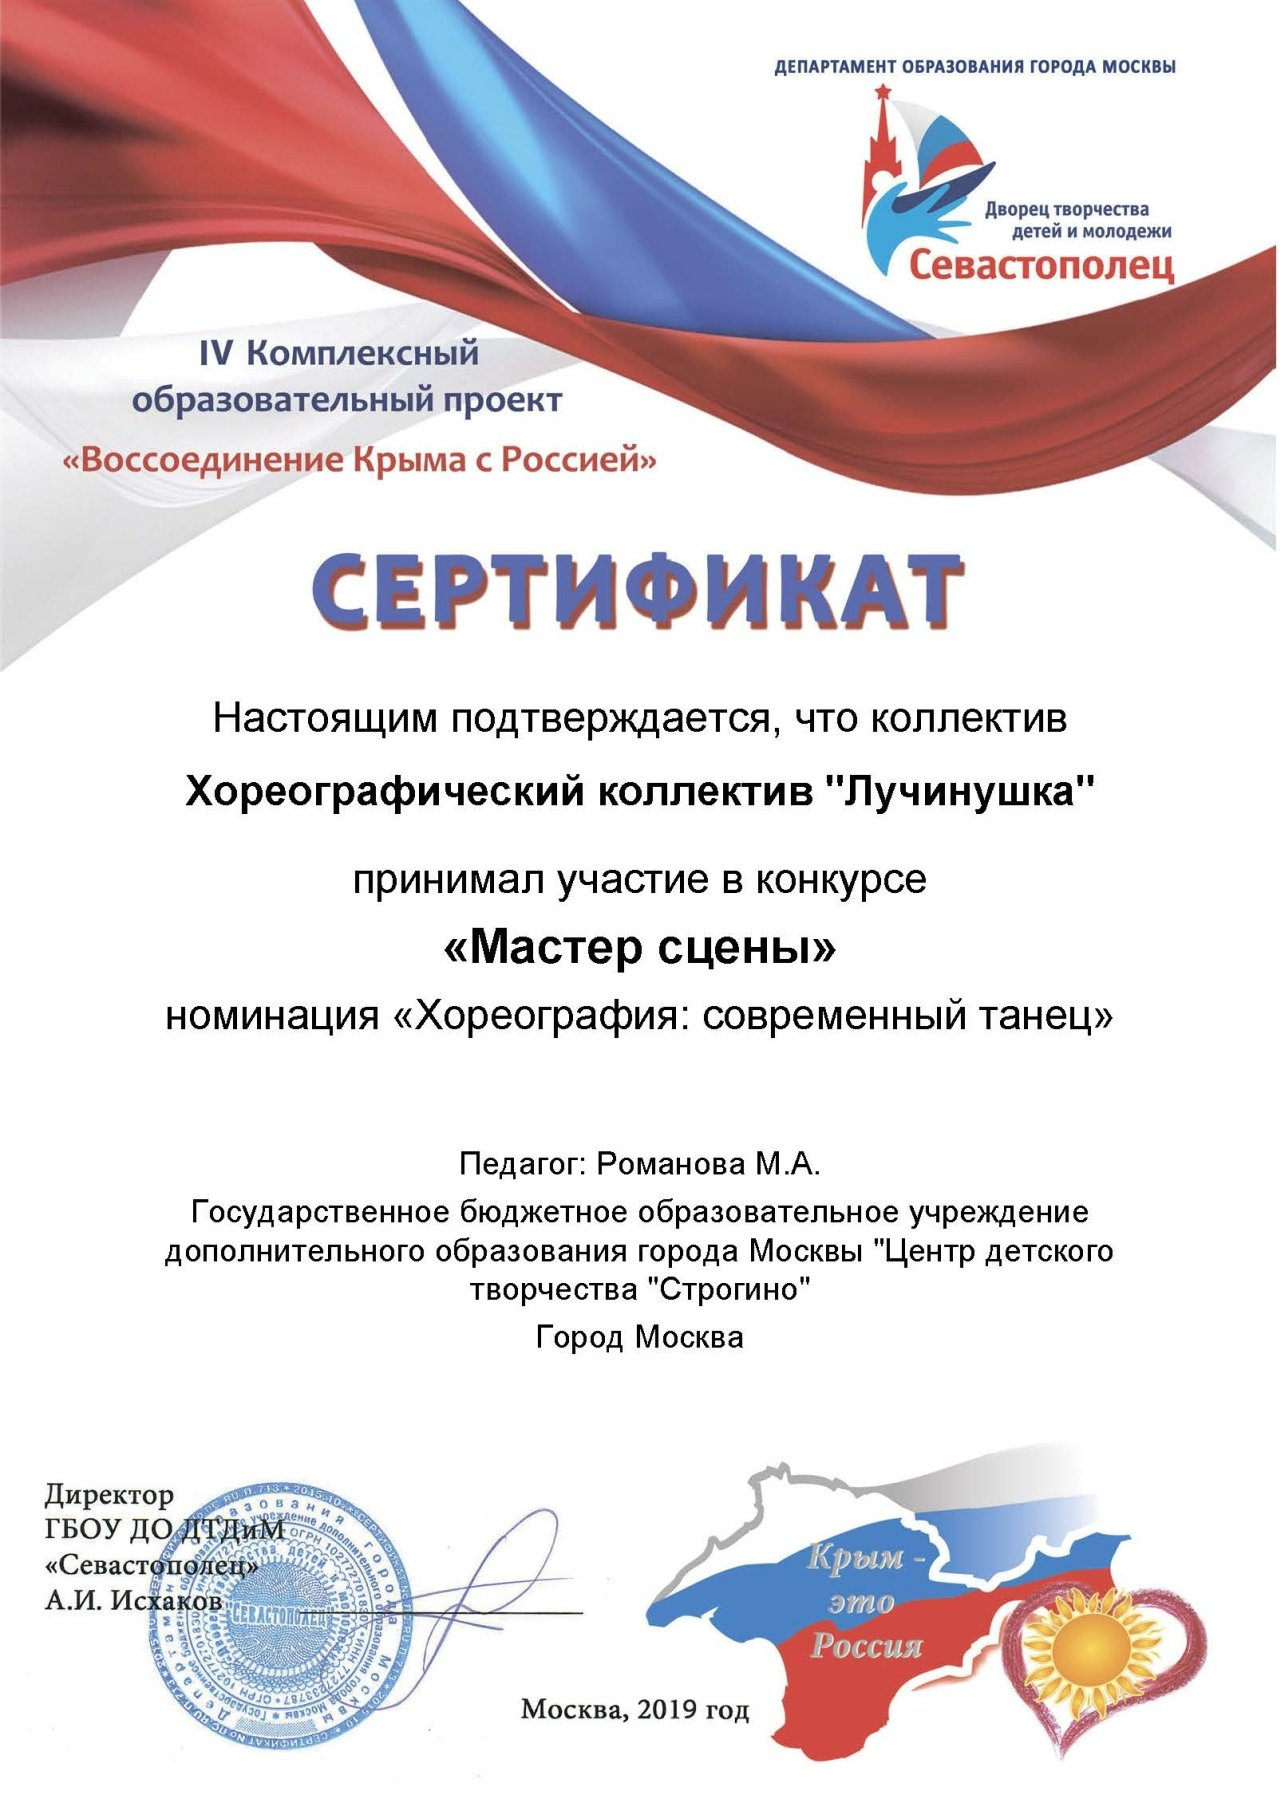 certificate-sevastopolec-2019.jpg